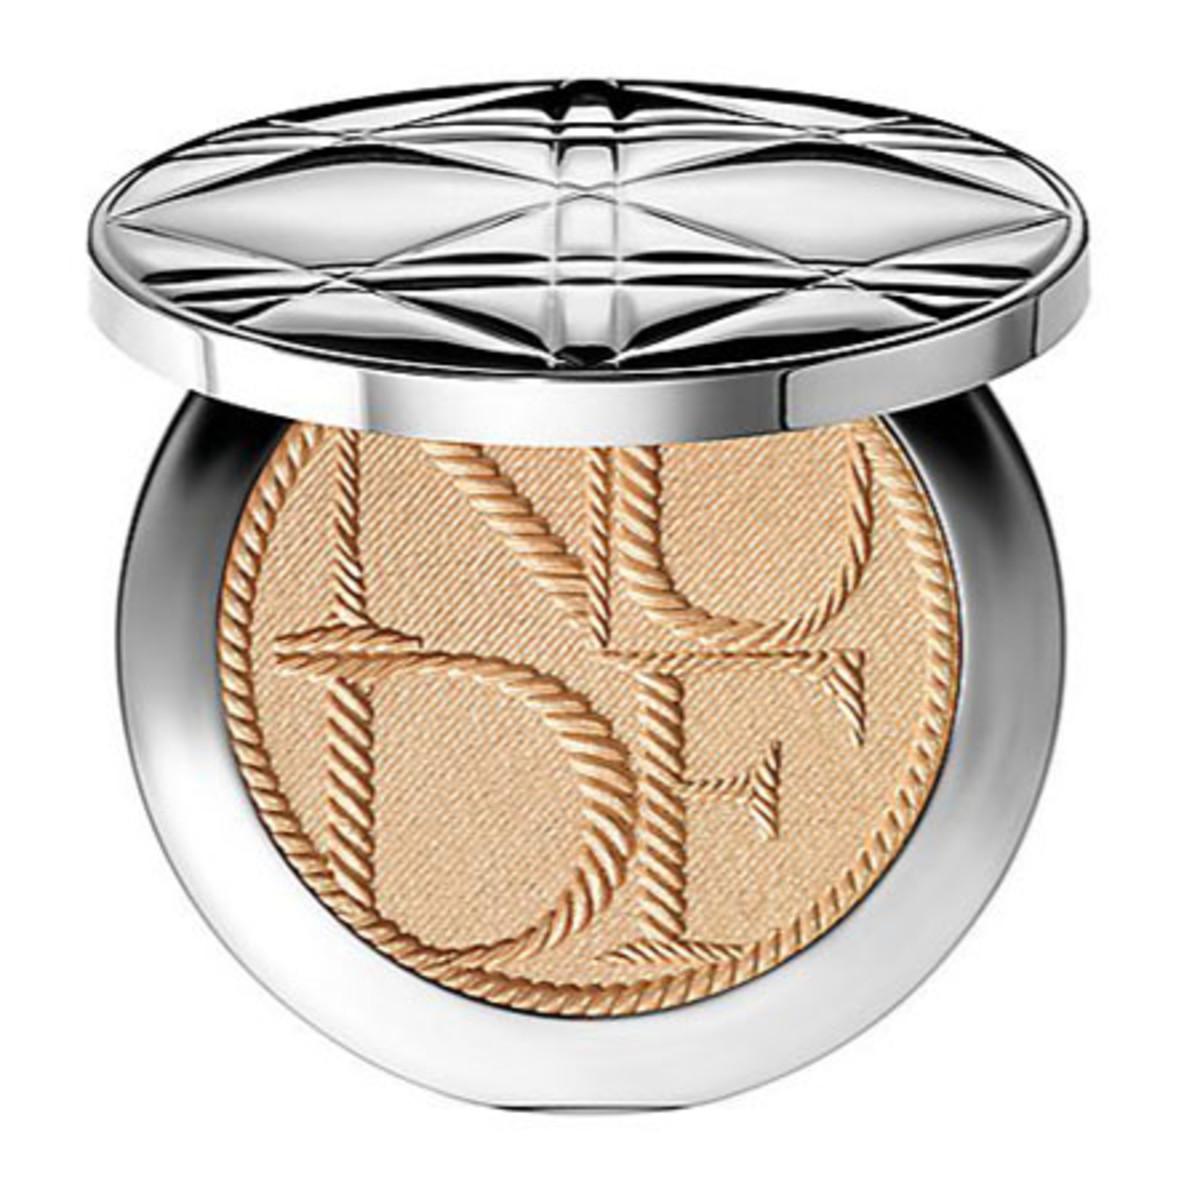 Dior Diorskin Voyage Nude Tan Golden Shimmer Powder Transit Edition